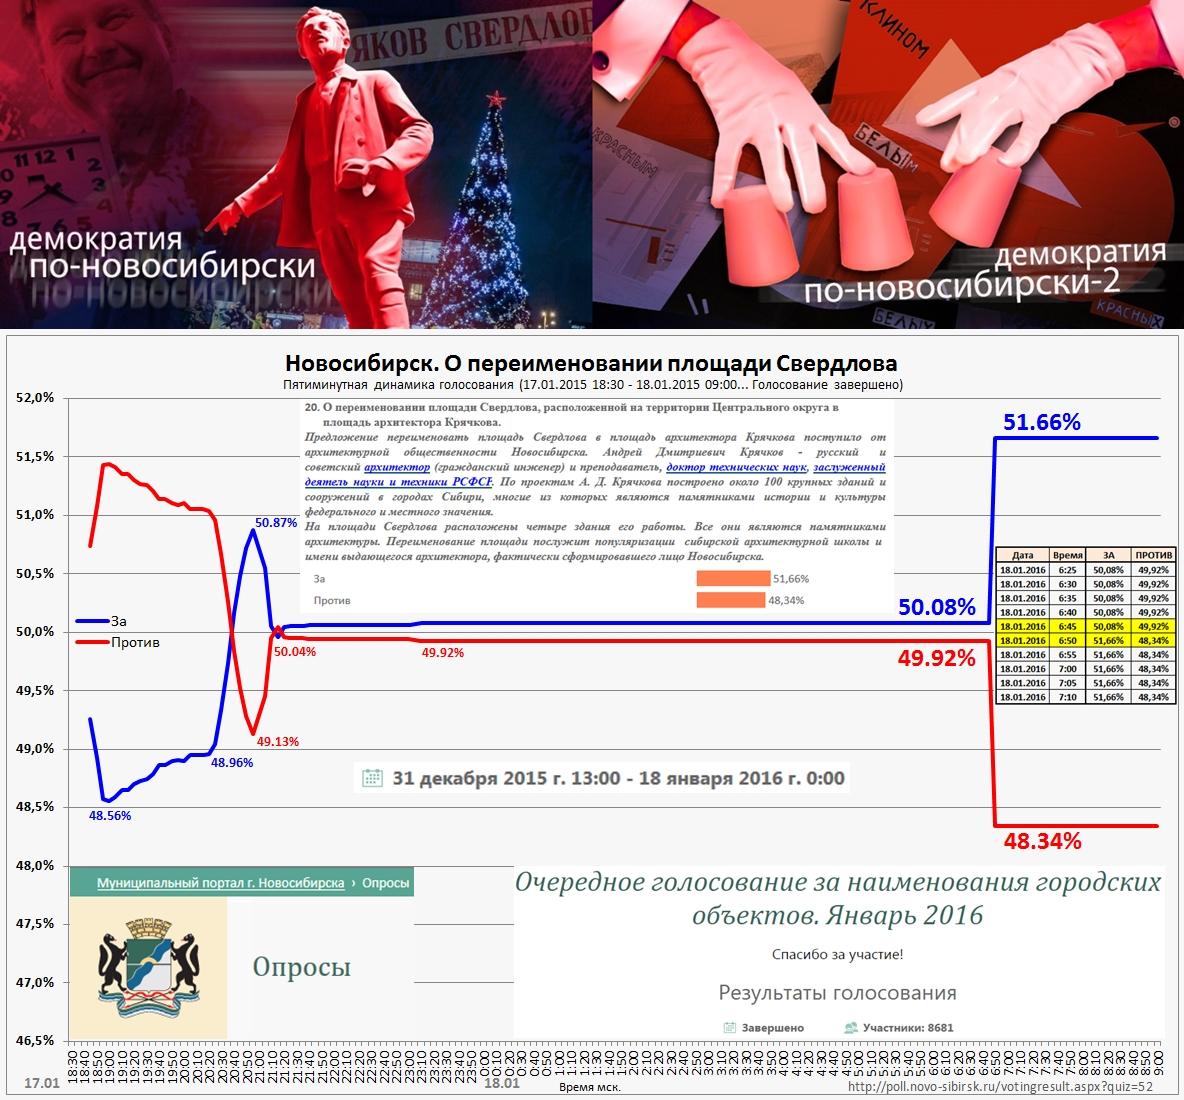 20160119-Демократия по-новосибирски, часть 2 — накрутки-pic13